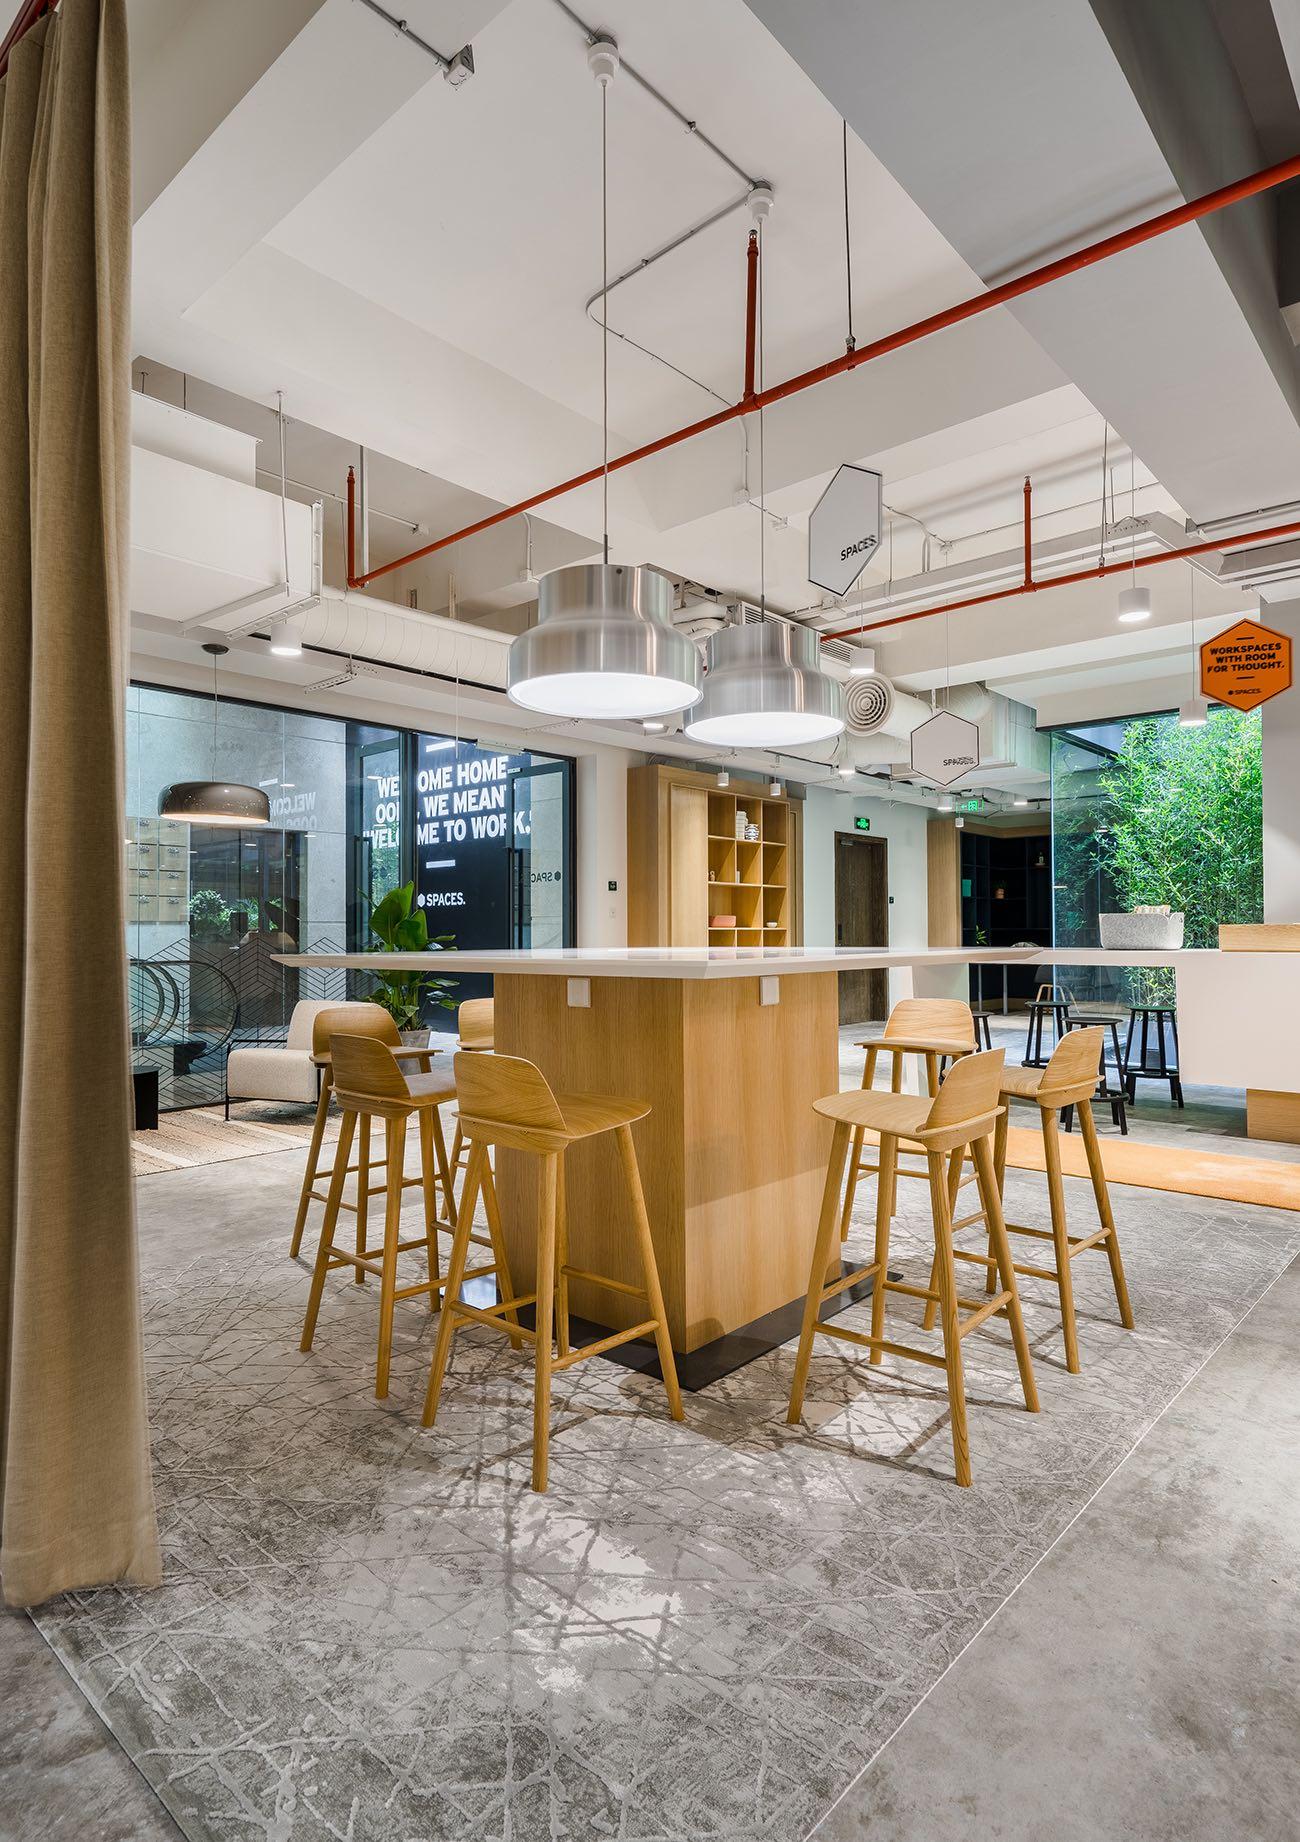 A Look Inside Spaces' Shanghai Coworking Space